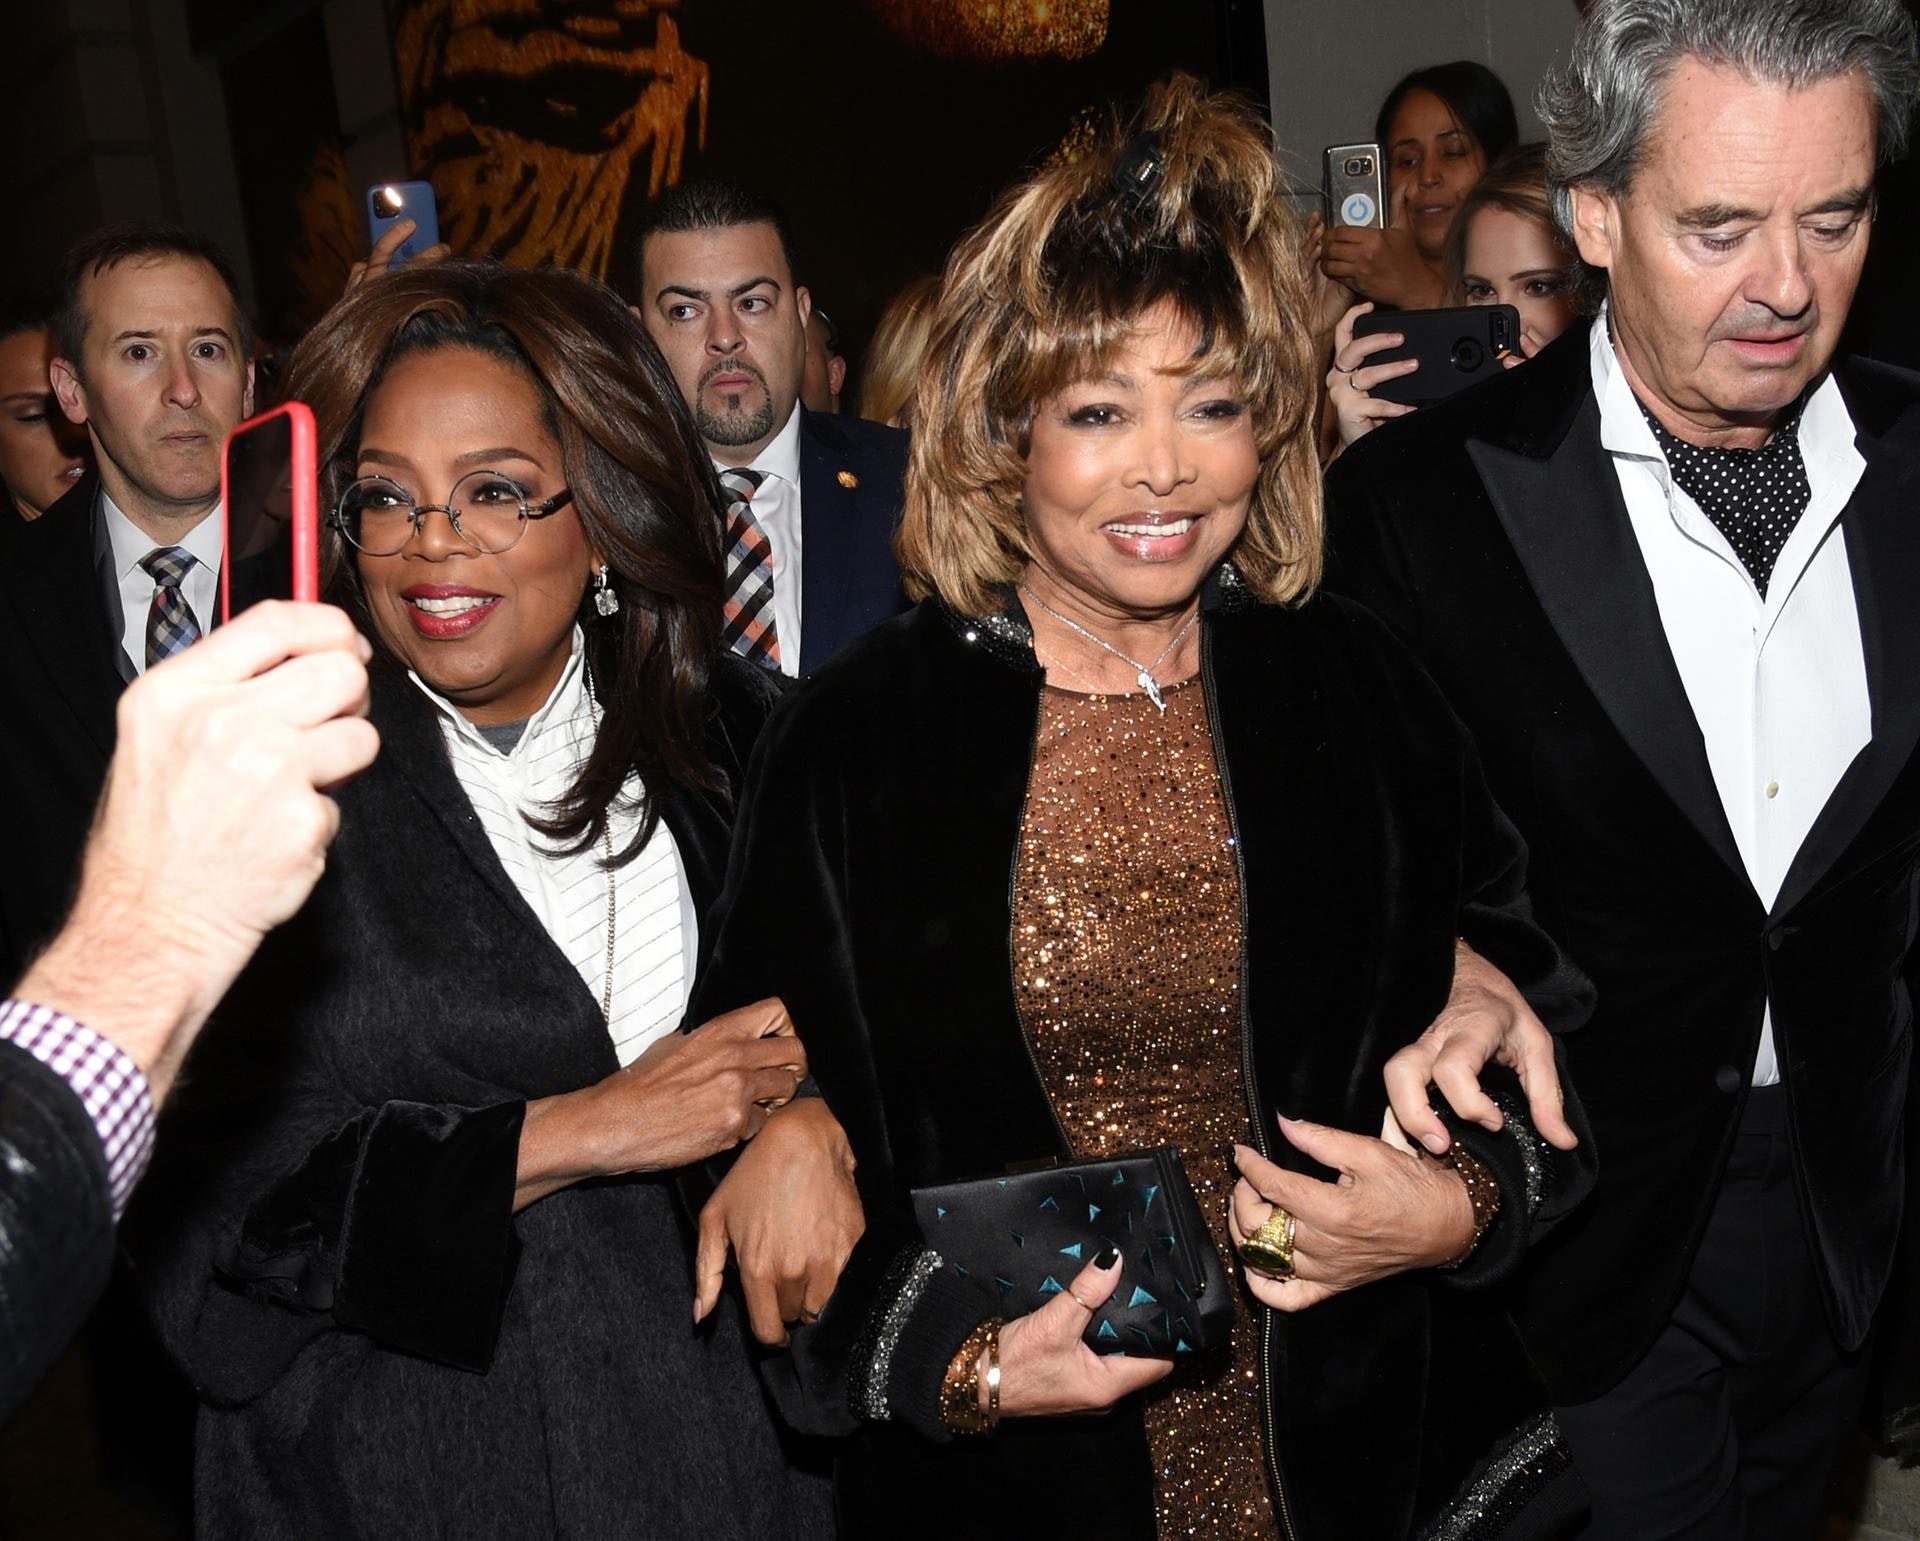 Bilder erwin turner tina und bach Tina Turner,